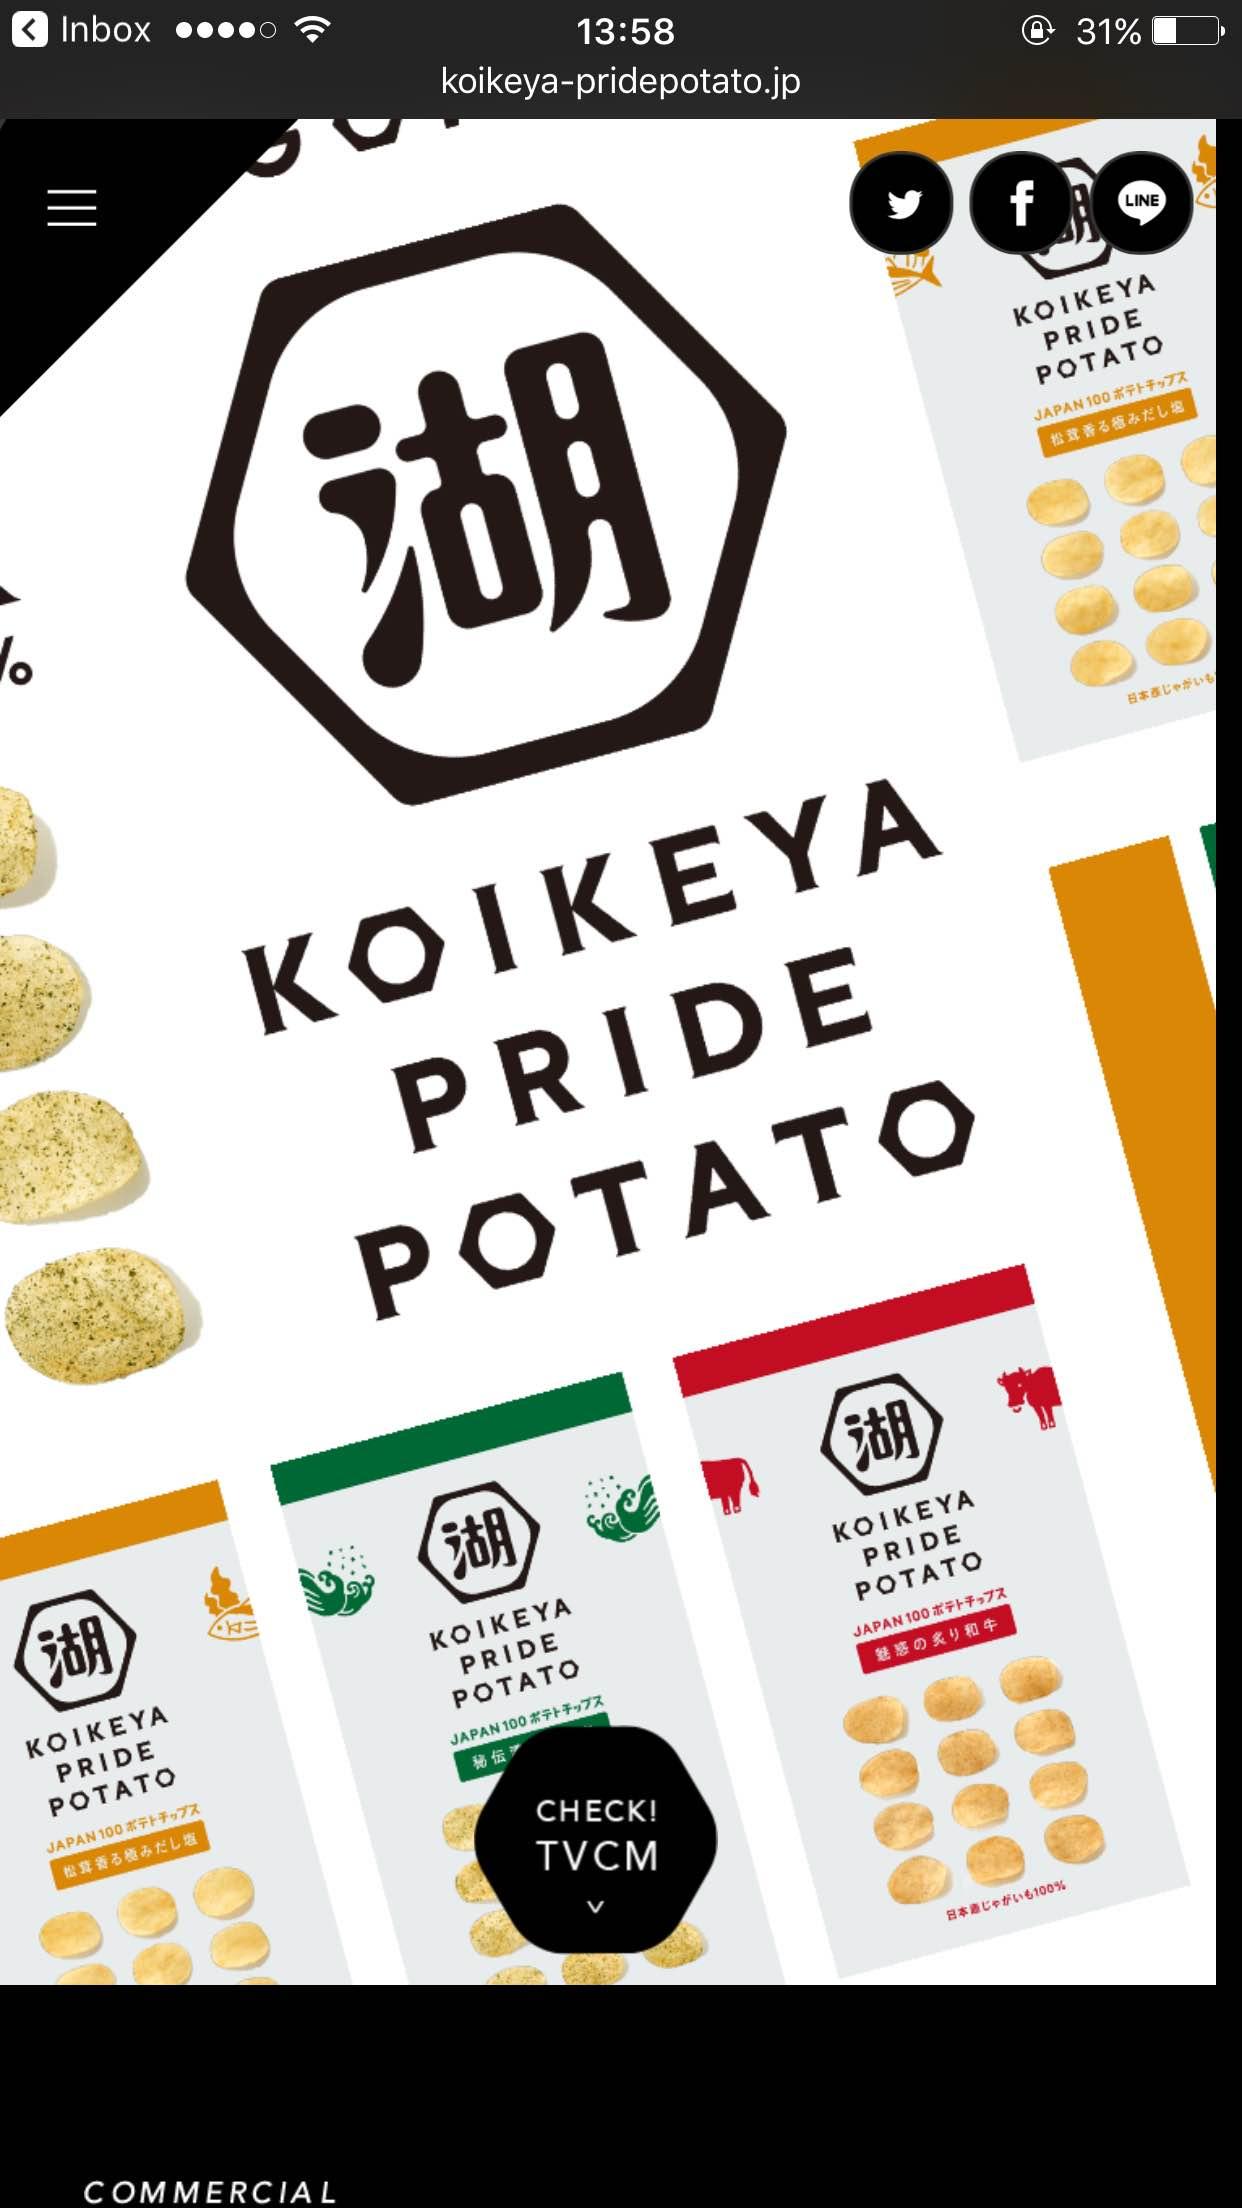 KOIKEYA PRIDE POTATO|株式会社湖池屋